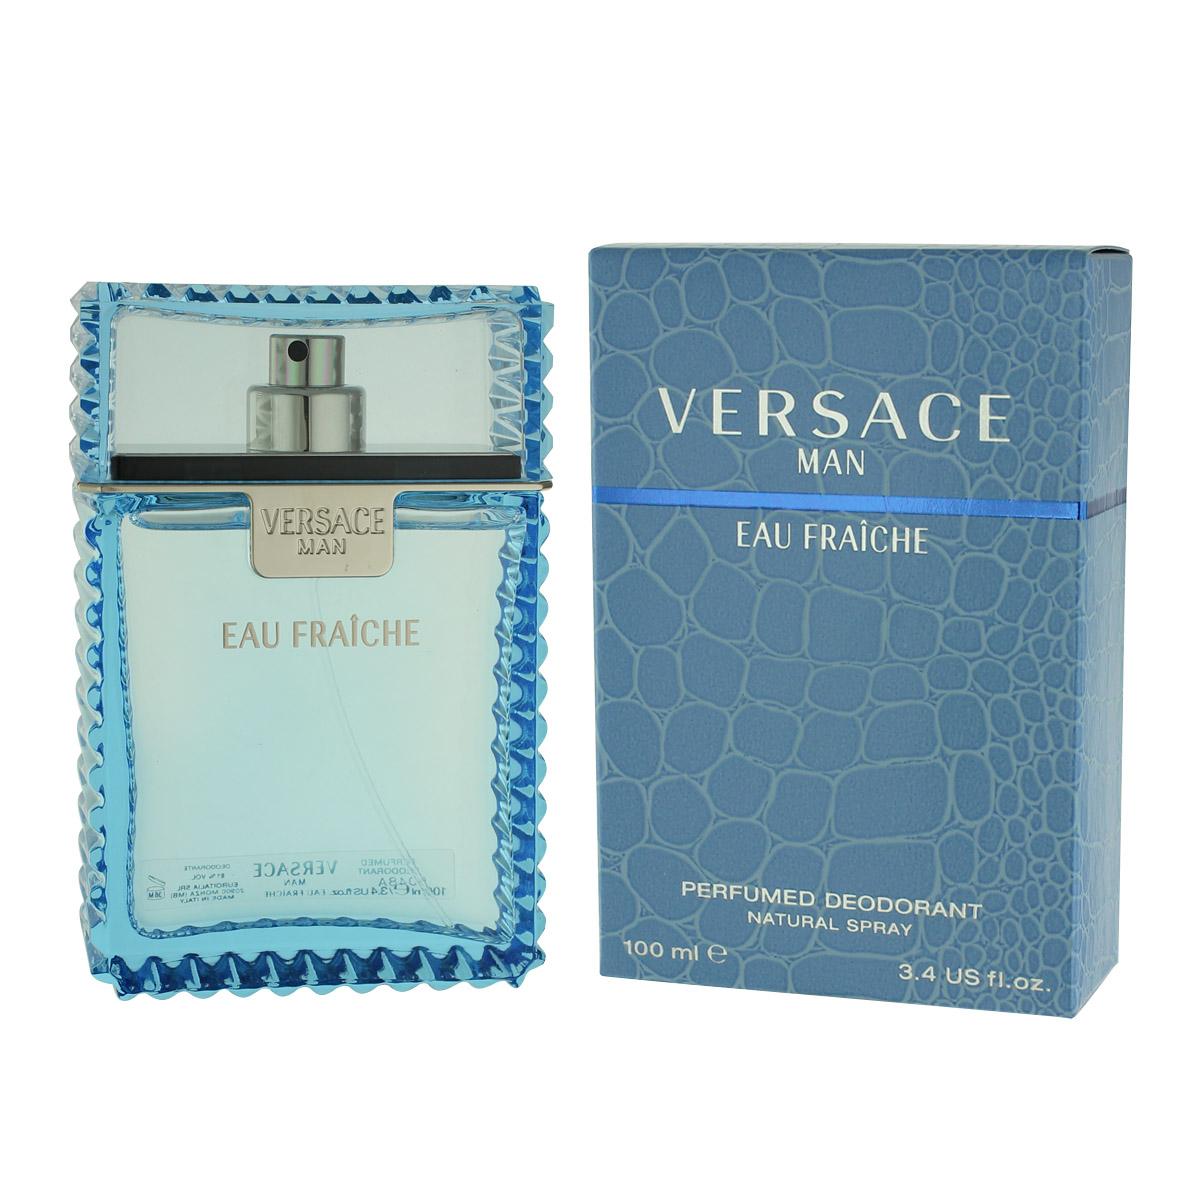 Versace Man Eau Fraîche Deodorant im Glas 100 ml (man) 78982